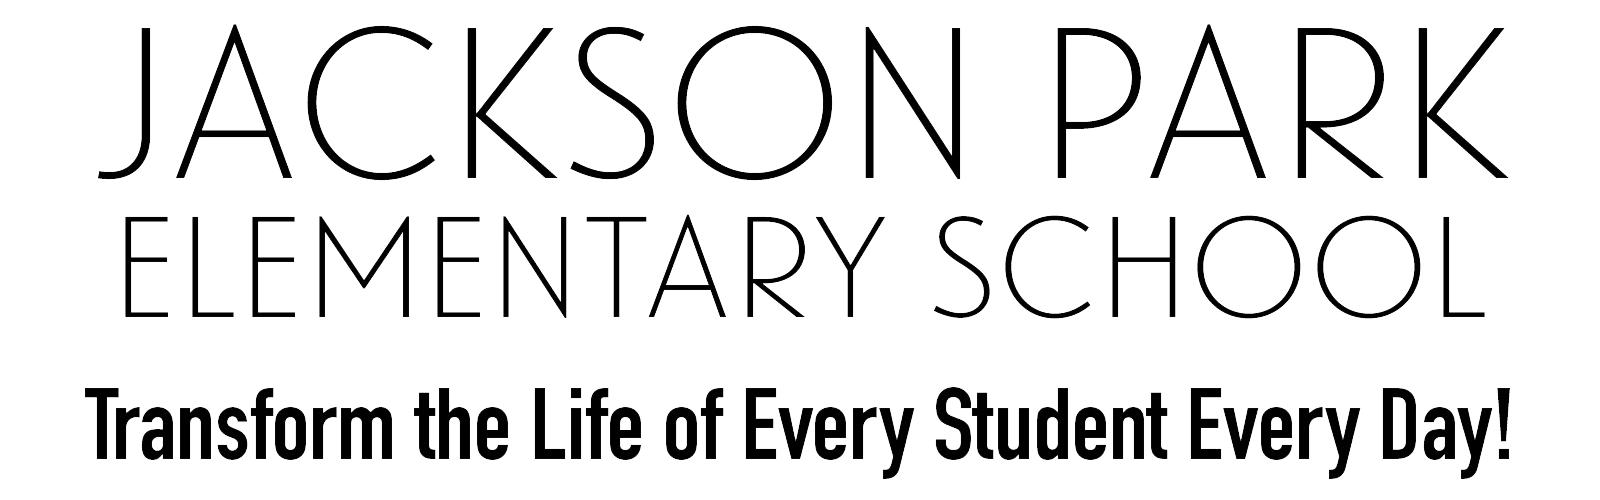 Jackson Park Elementary School / Homepage